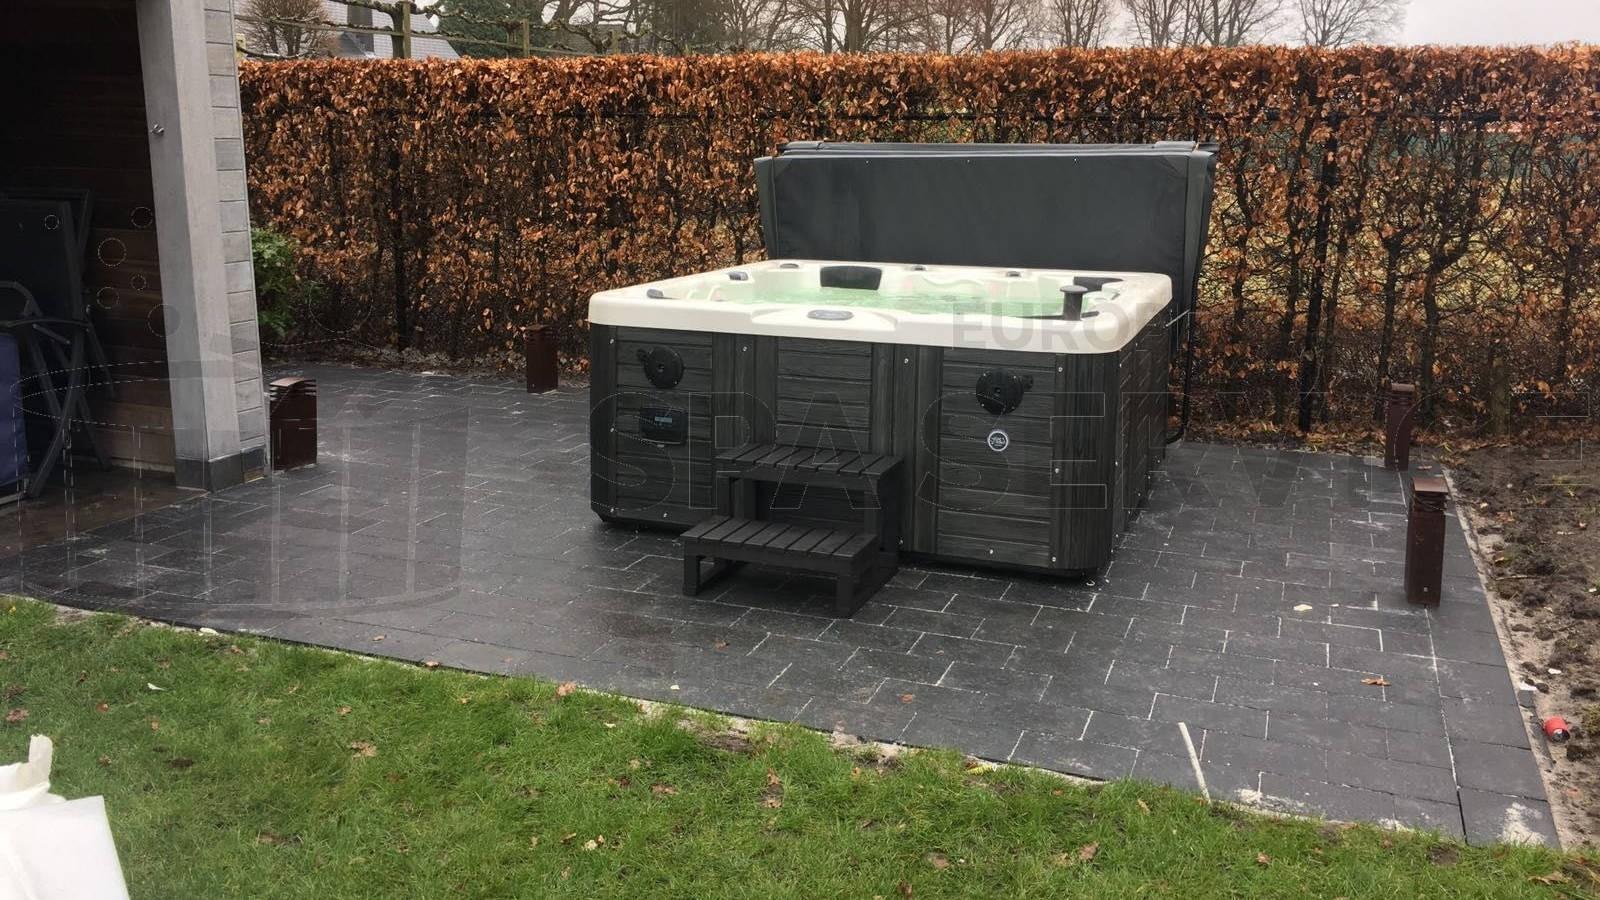 Plaatsing Four Winds Carolina spa in Essen België